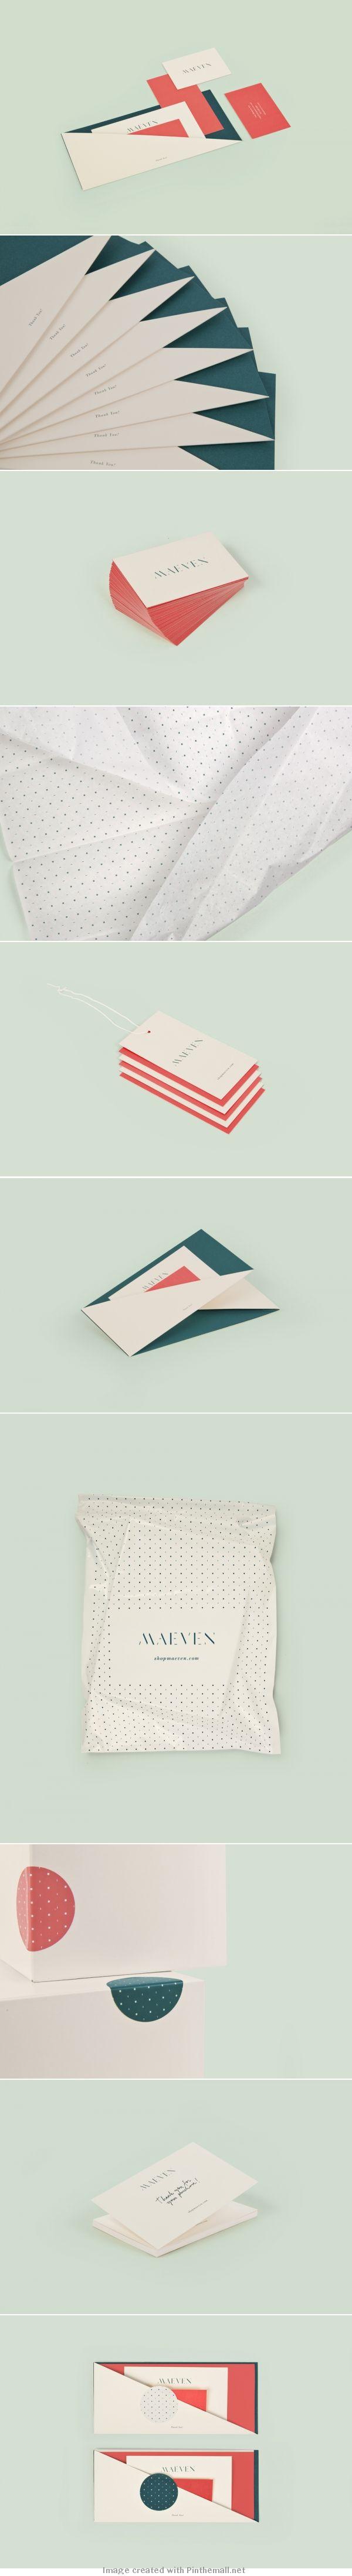 logo corporate branding visual graphic identity kraft paper design